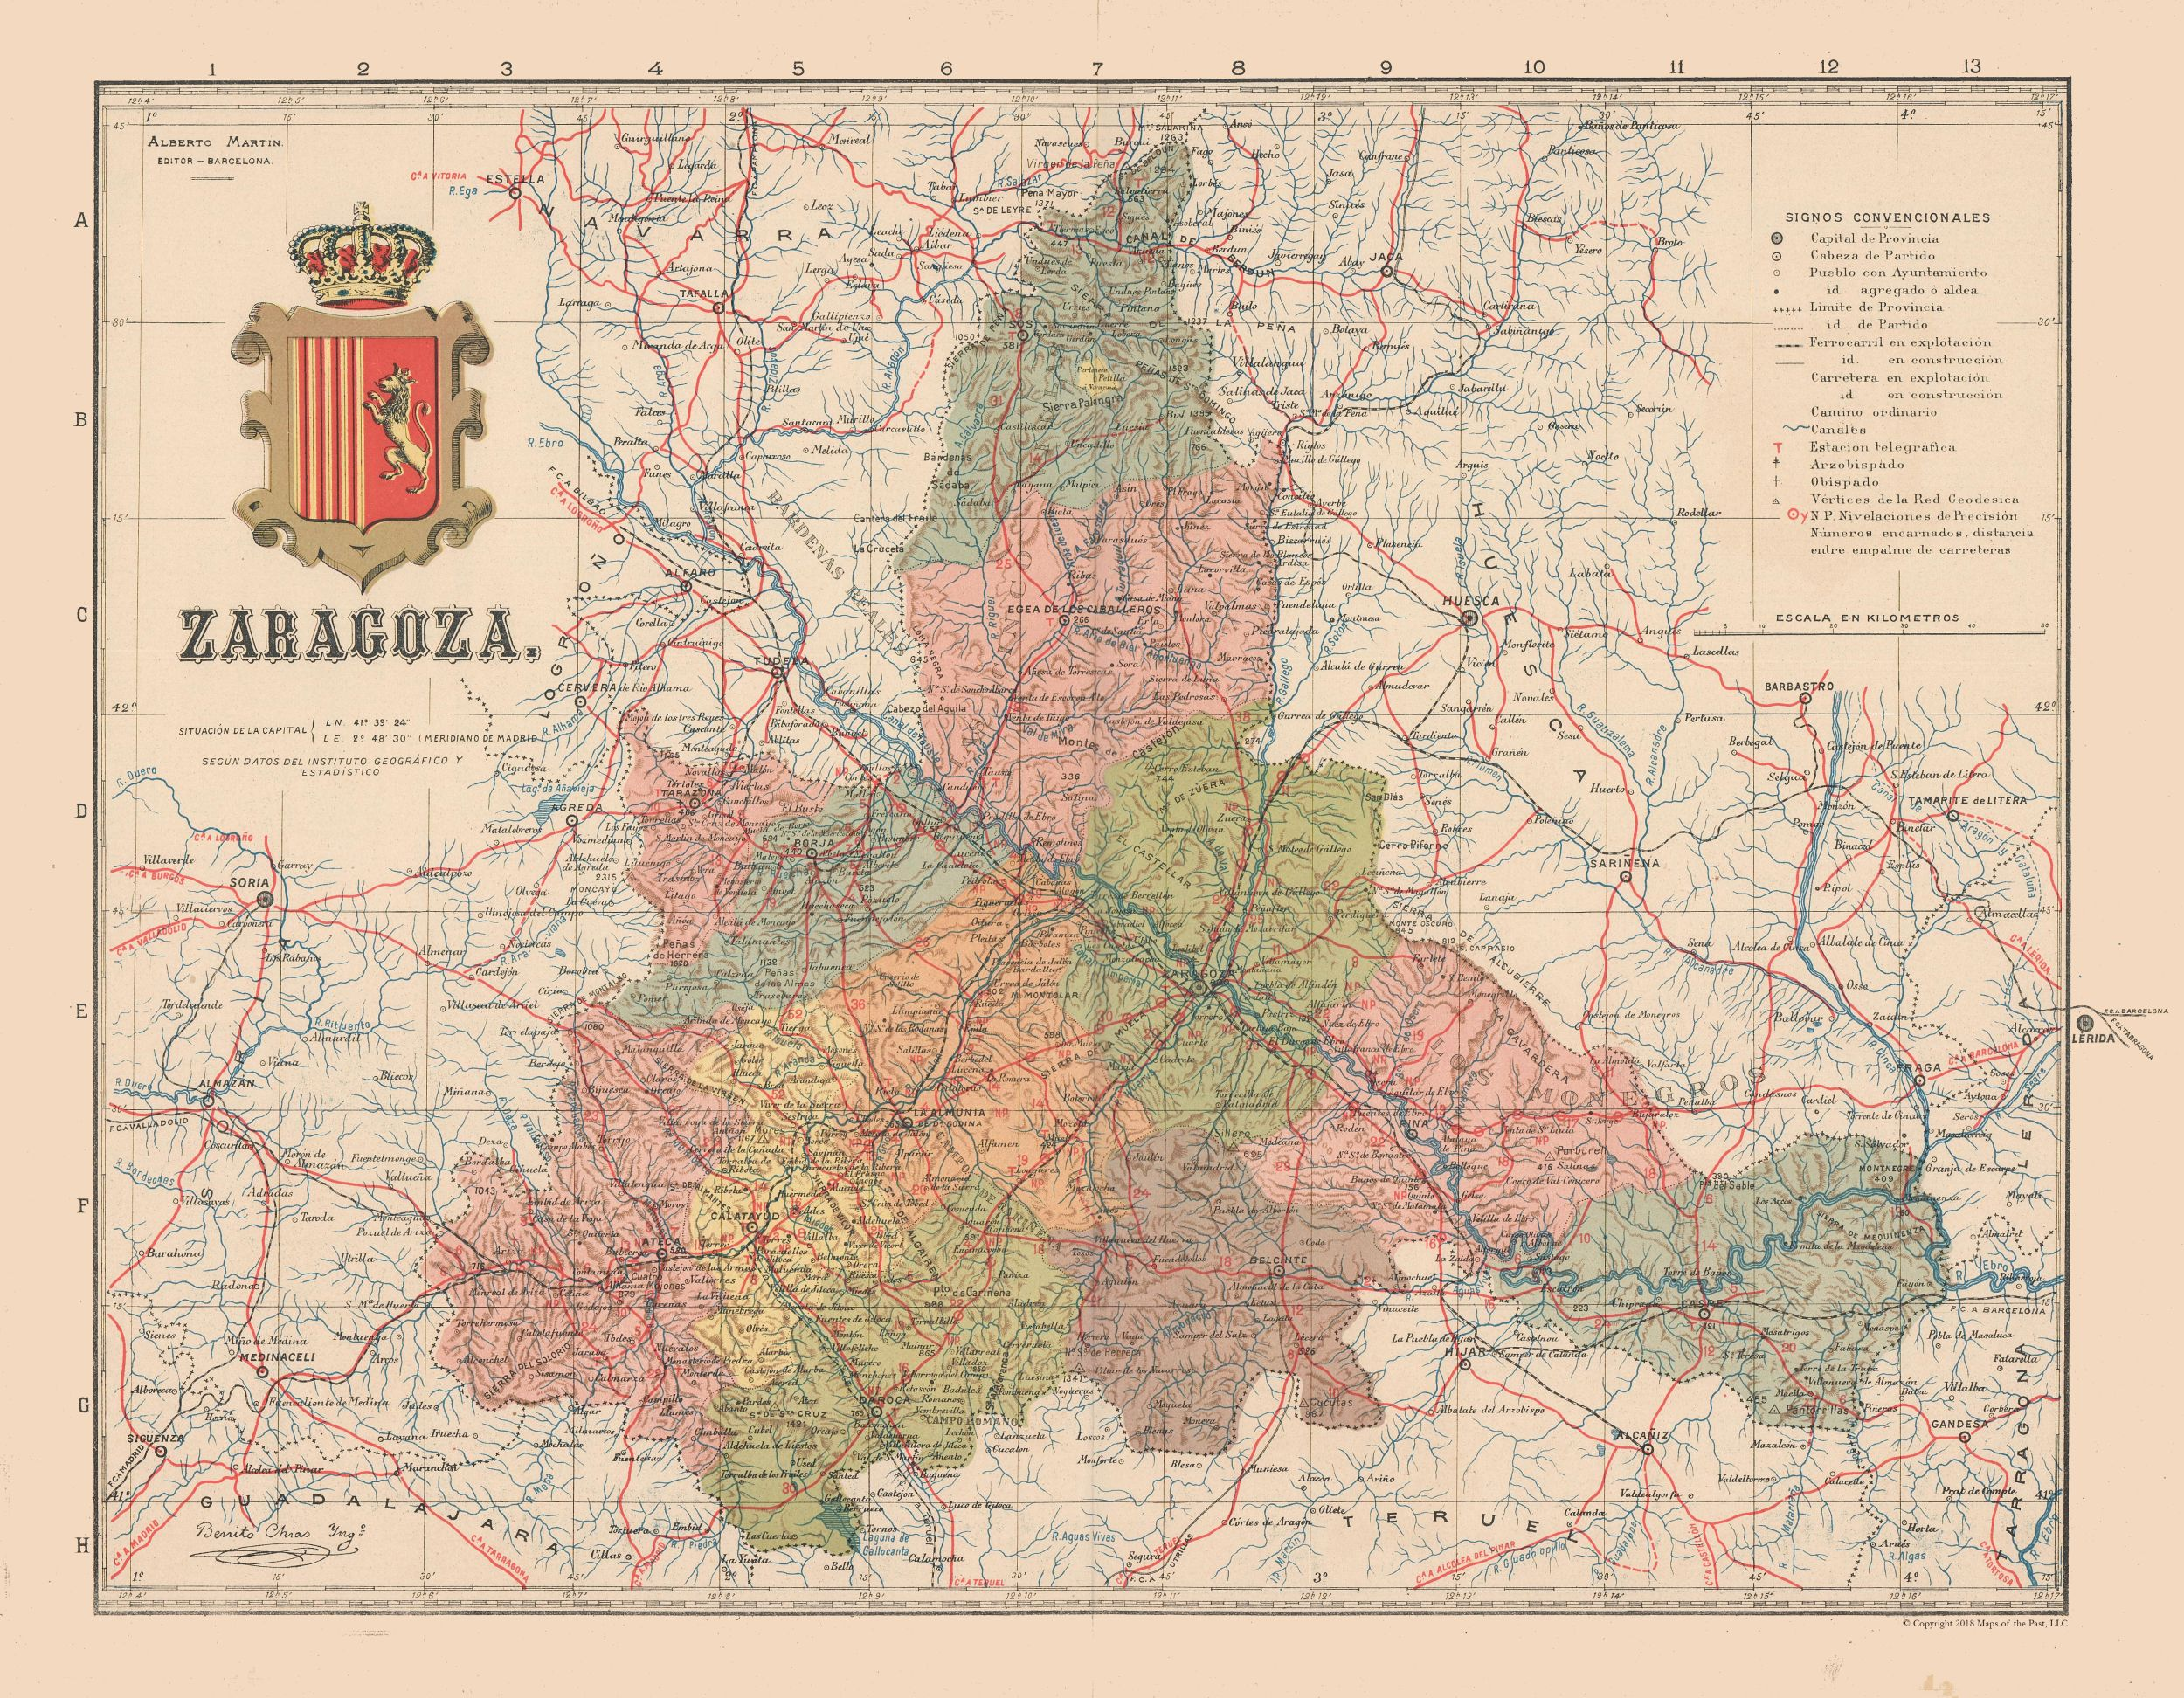 Map Of Spain Zaragoza.Old Spain Map Zaragoza Martin 1911 29 58 X 23 Walmart Com